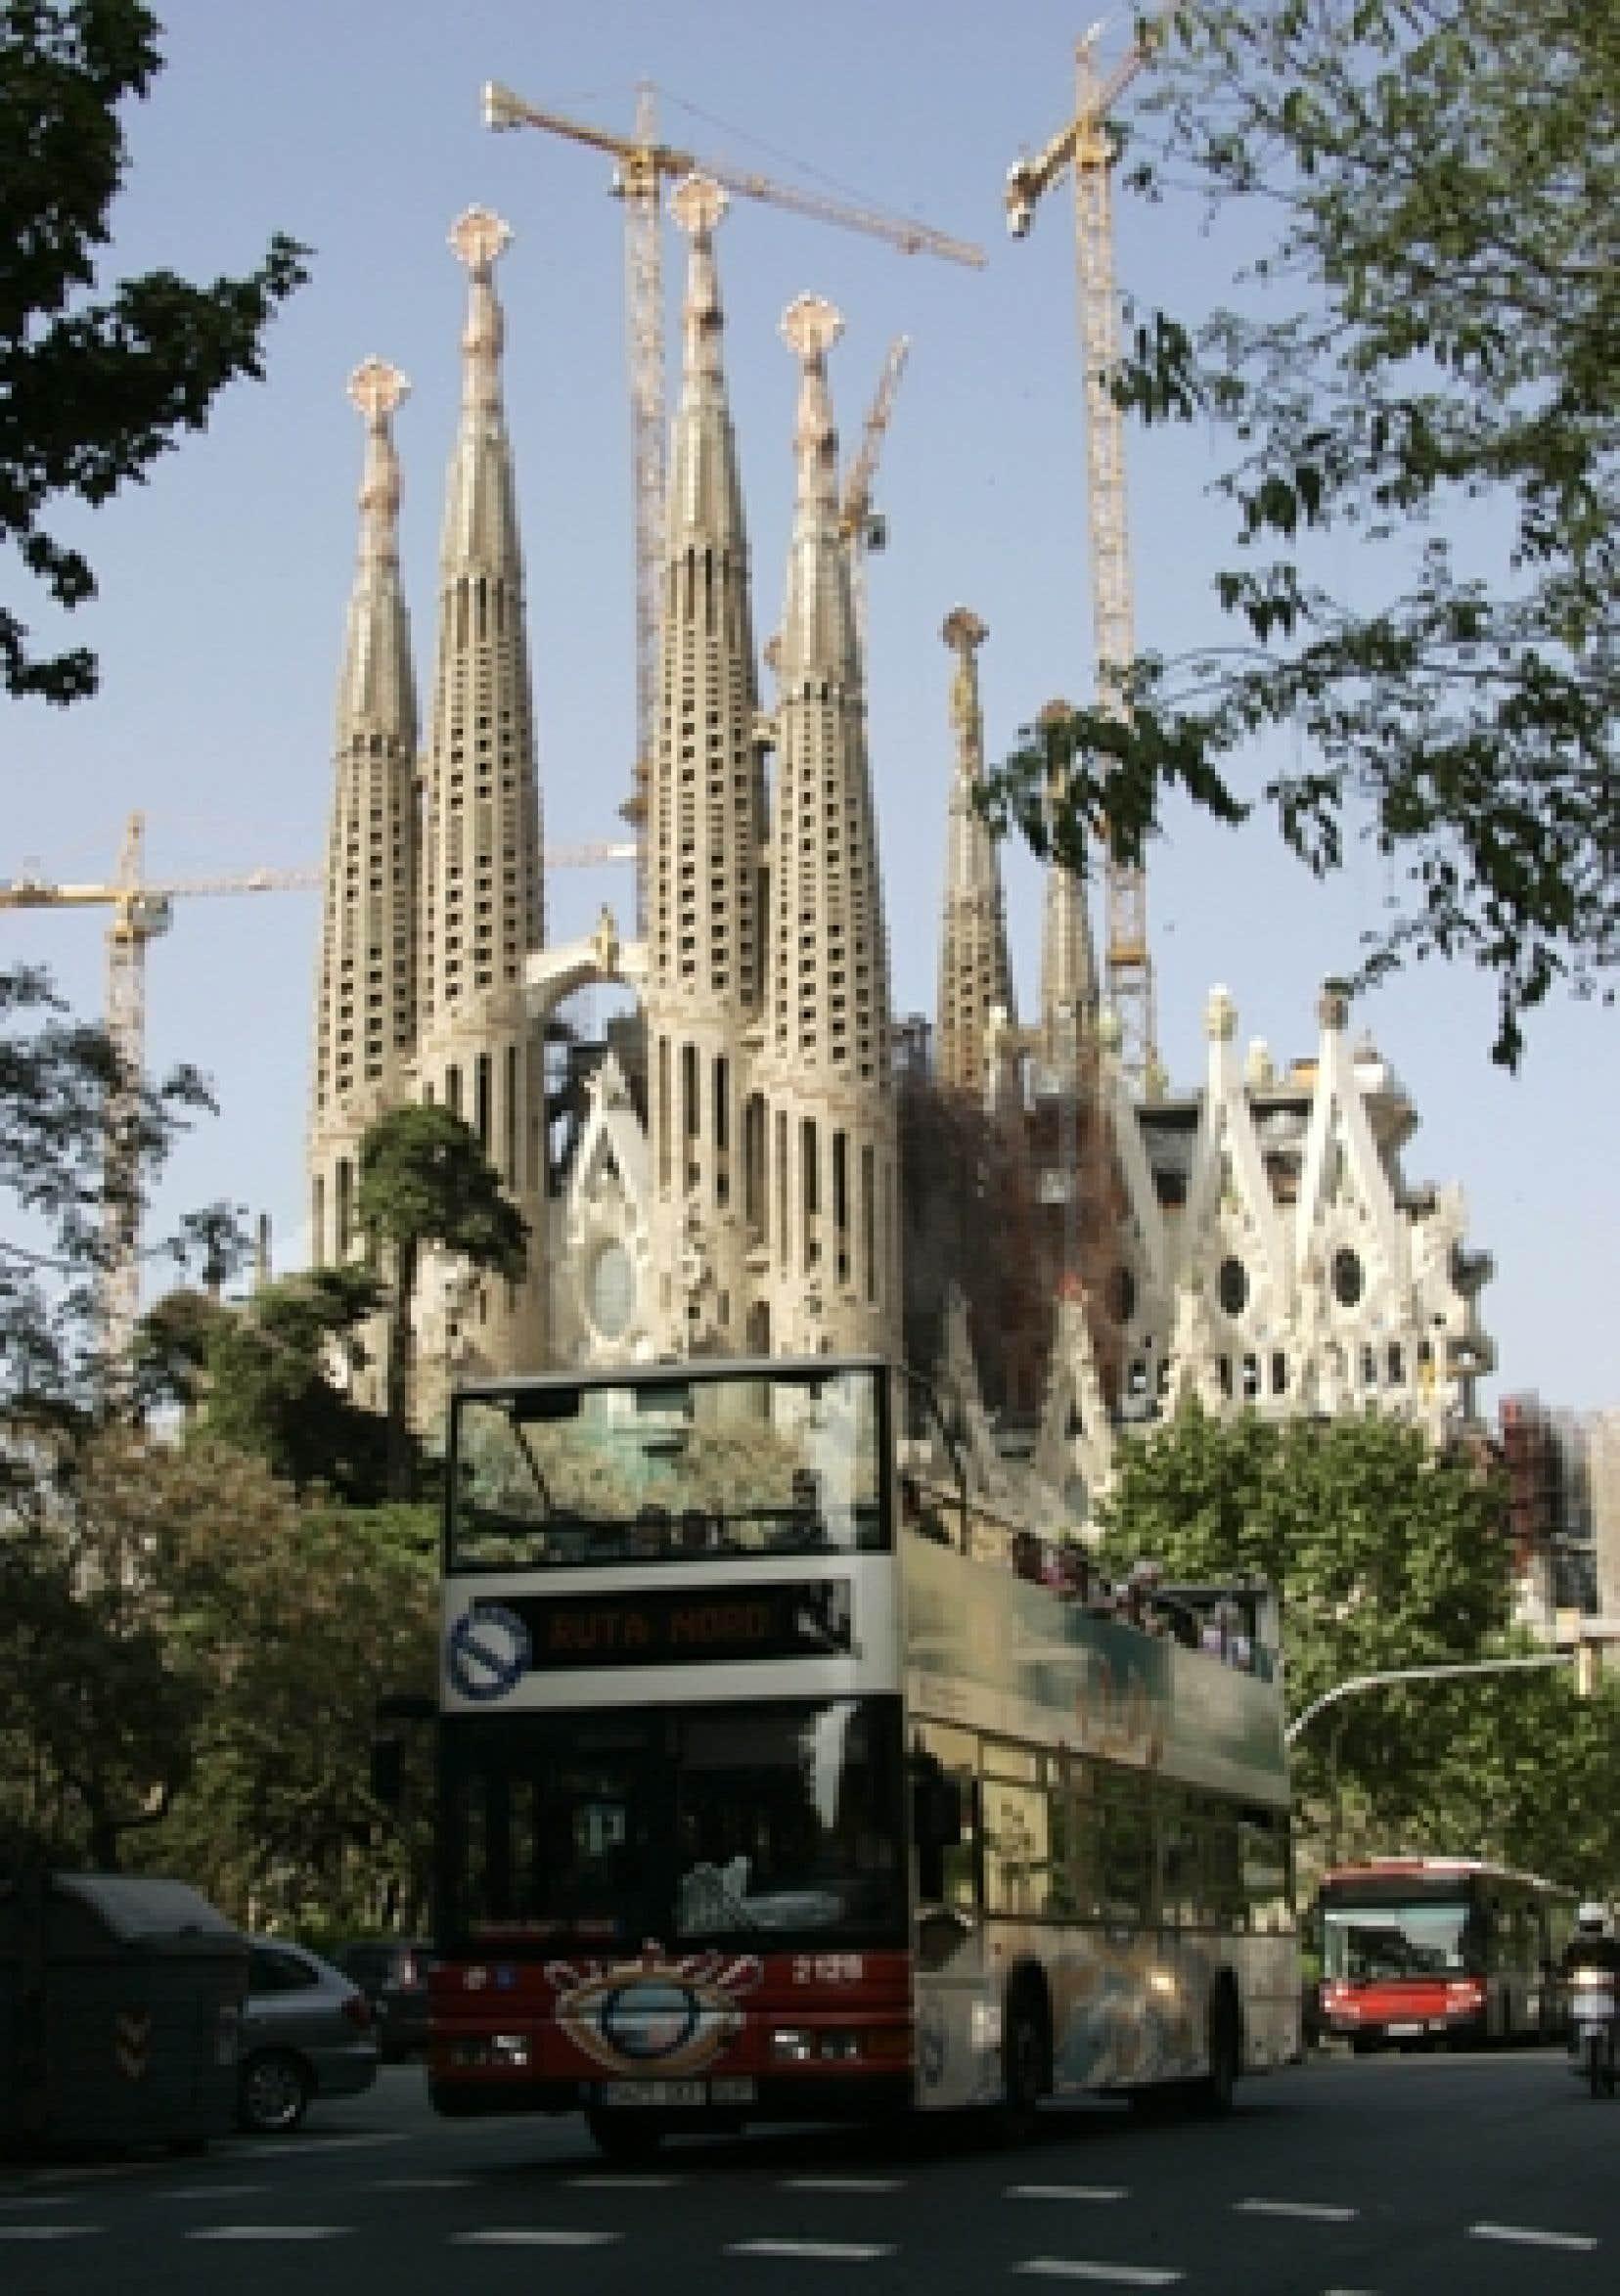 L'église Sagrada de Barcelone.